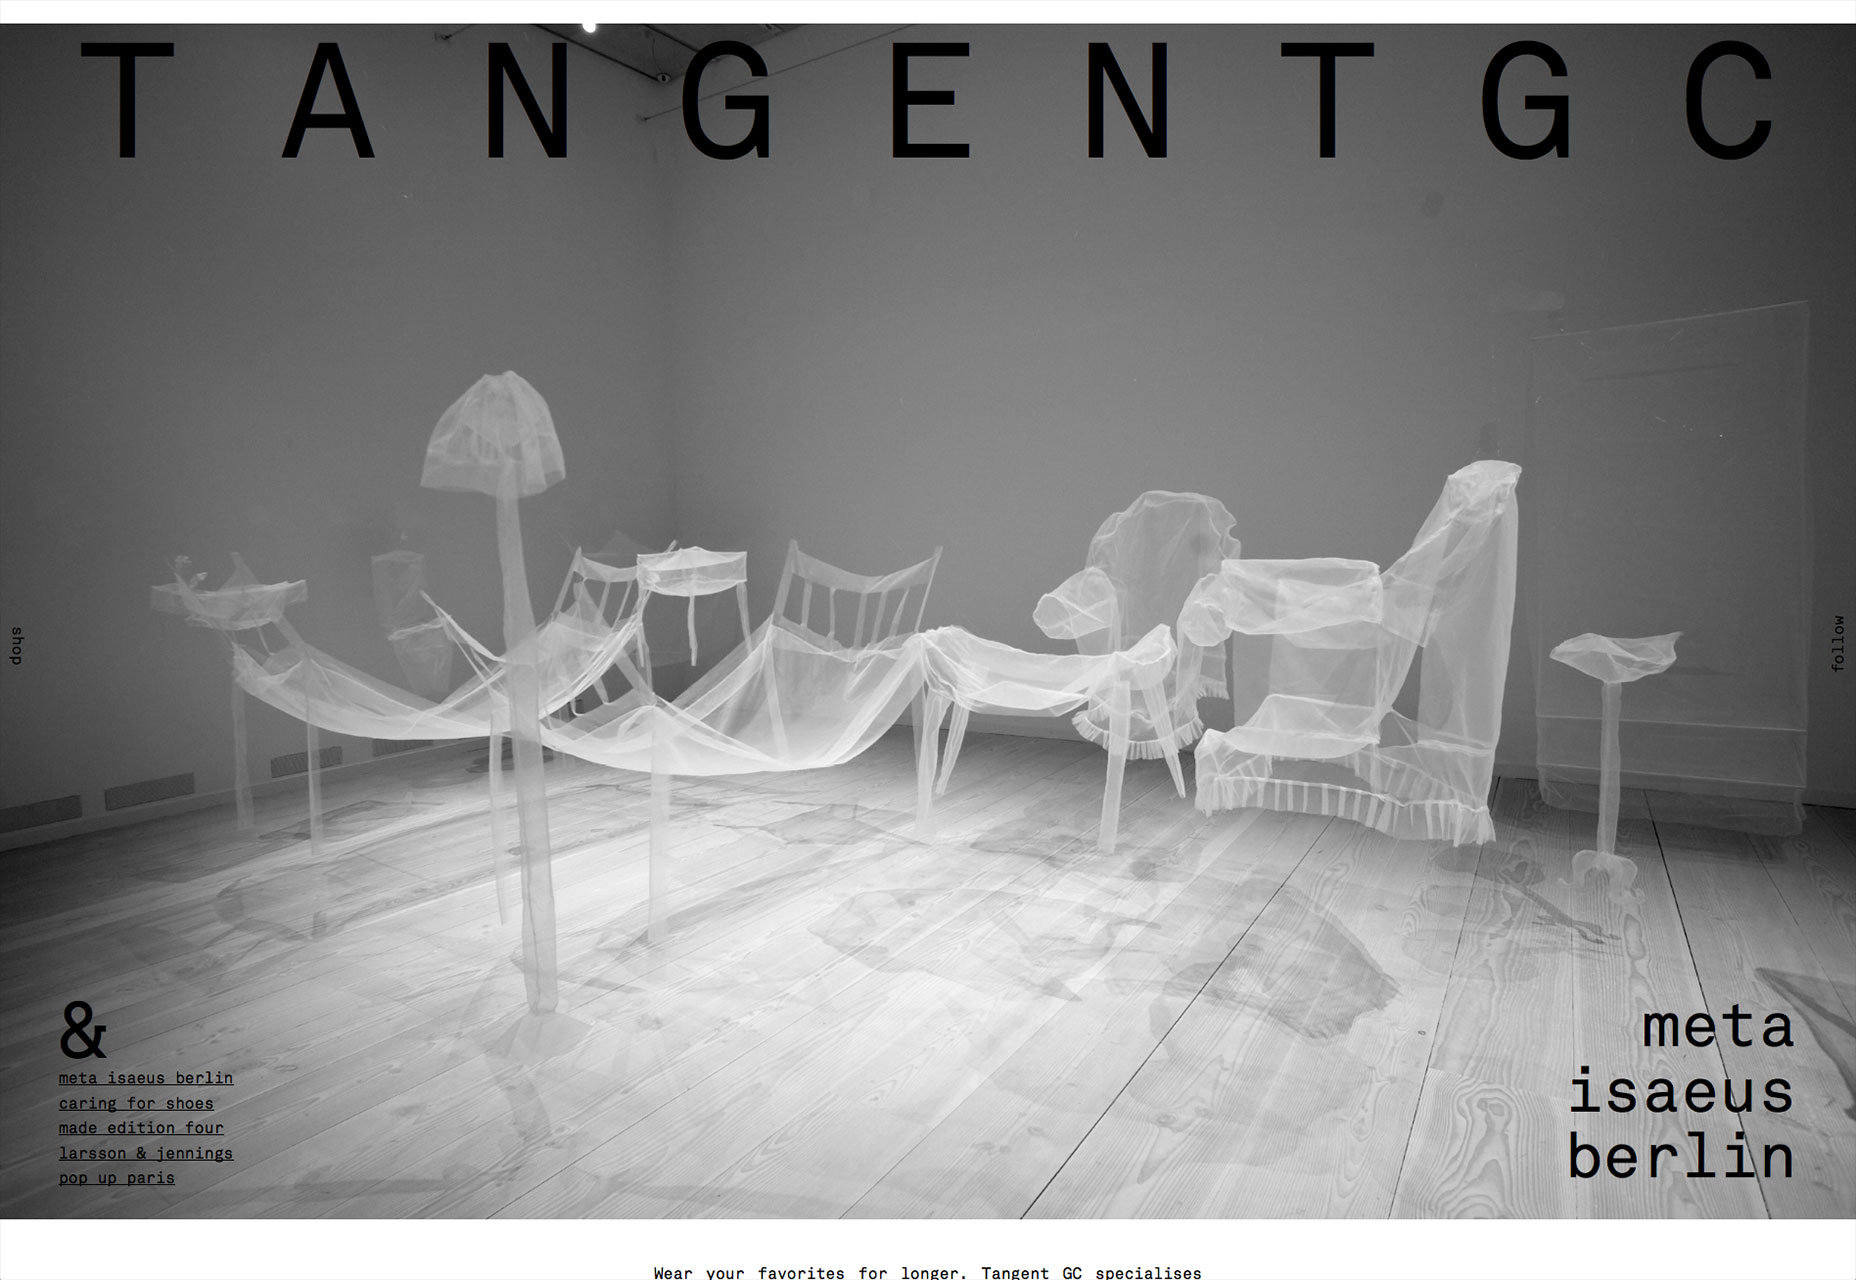 tangentgc